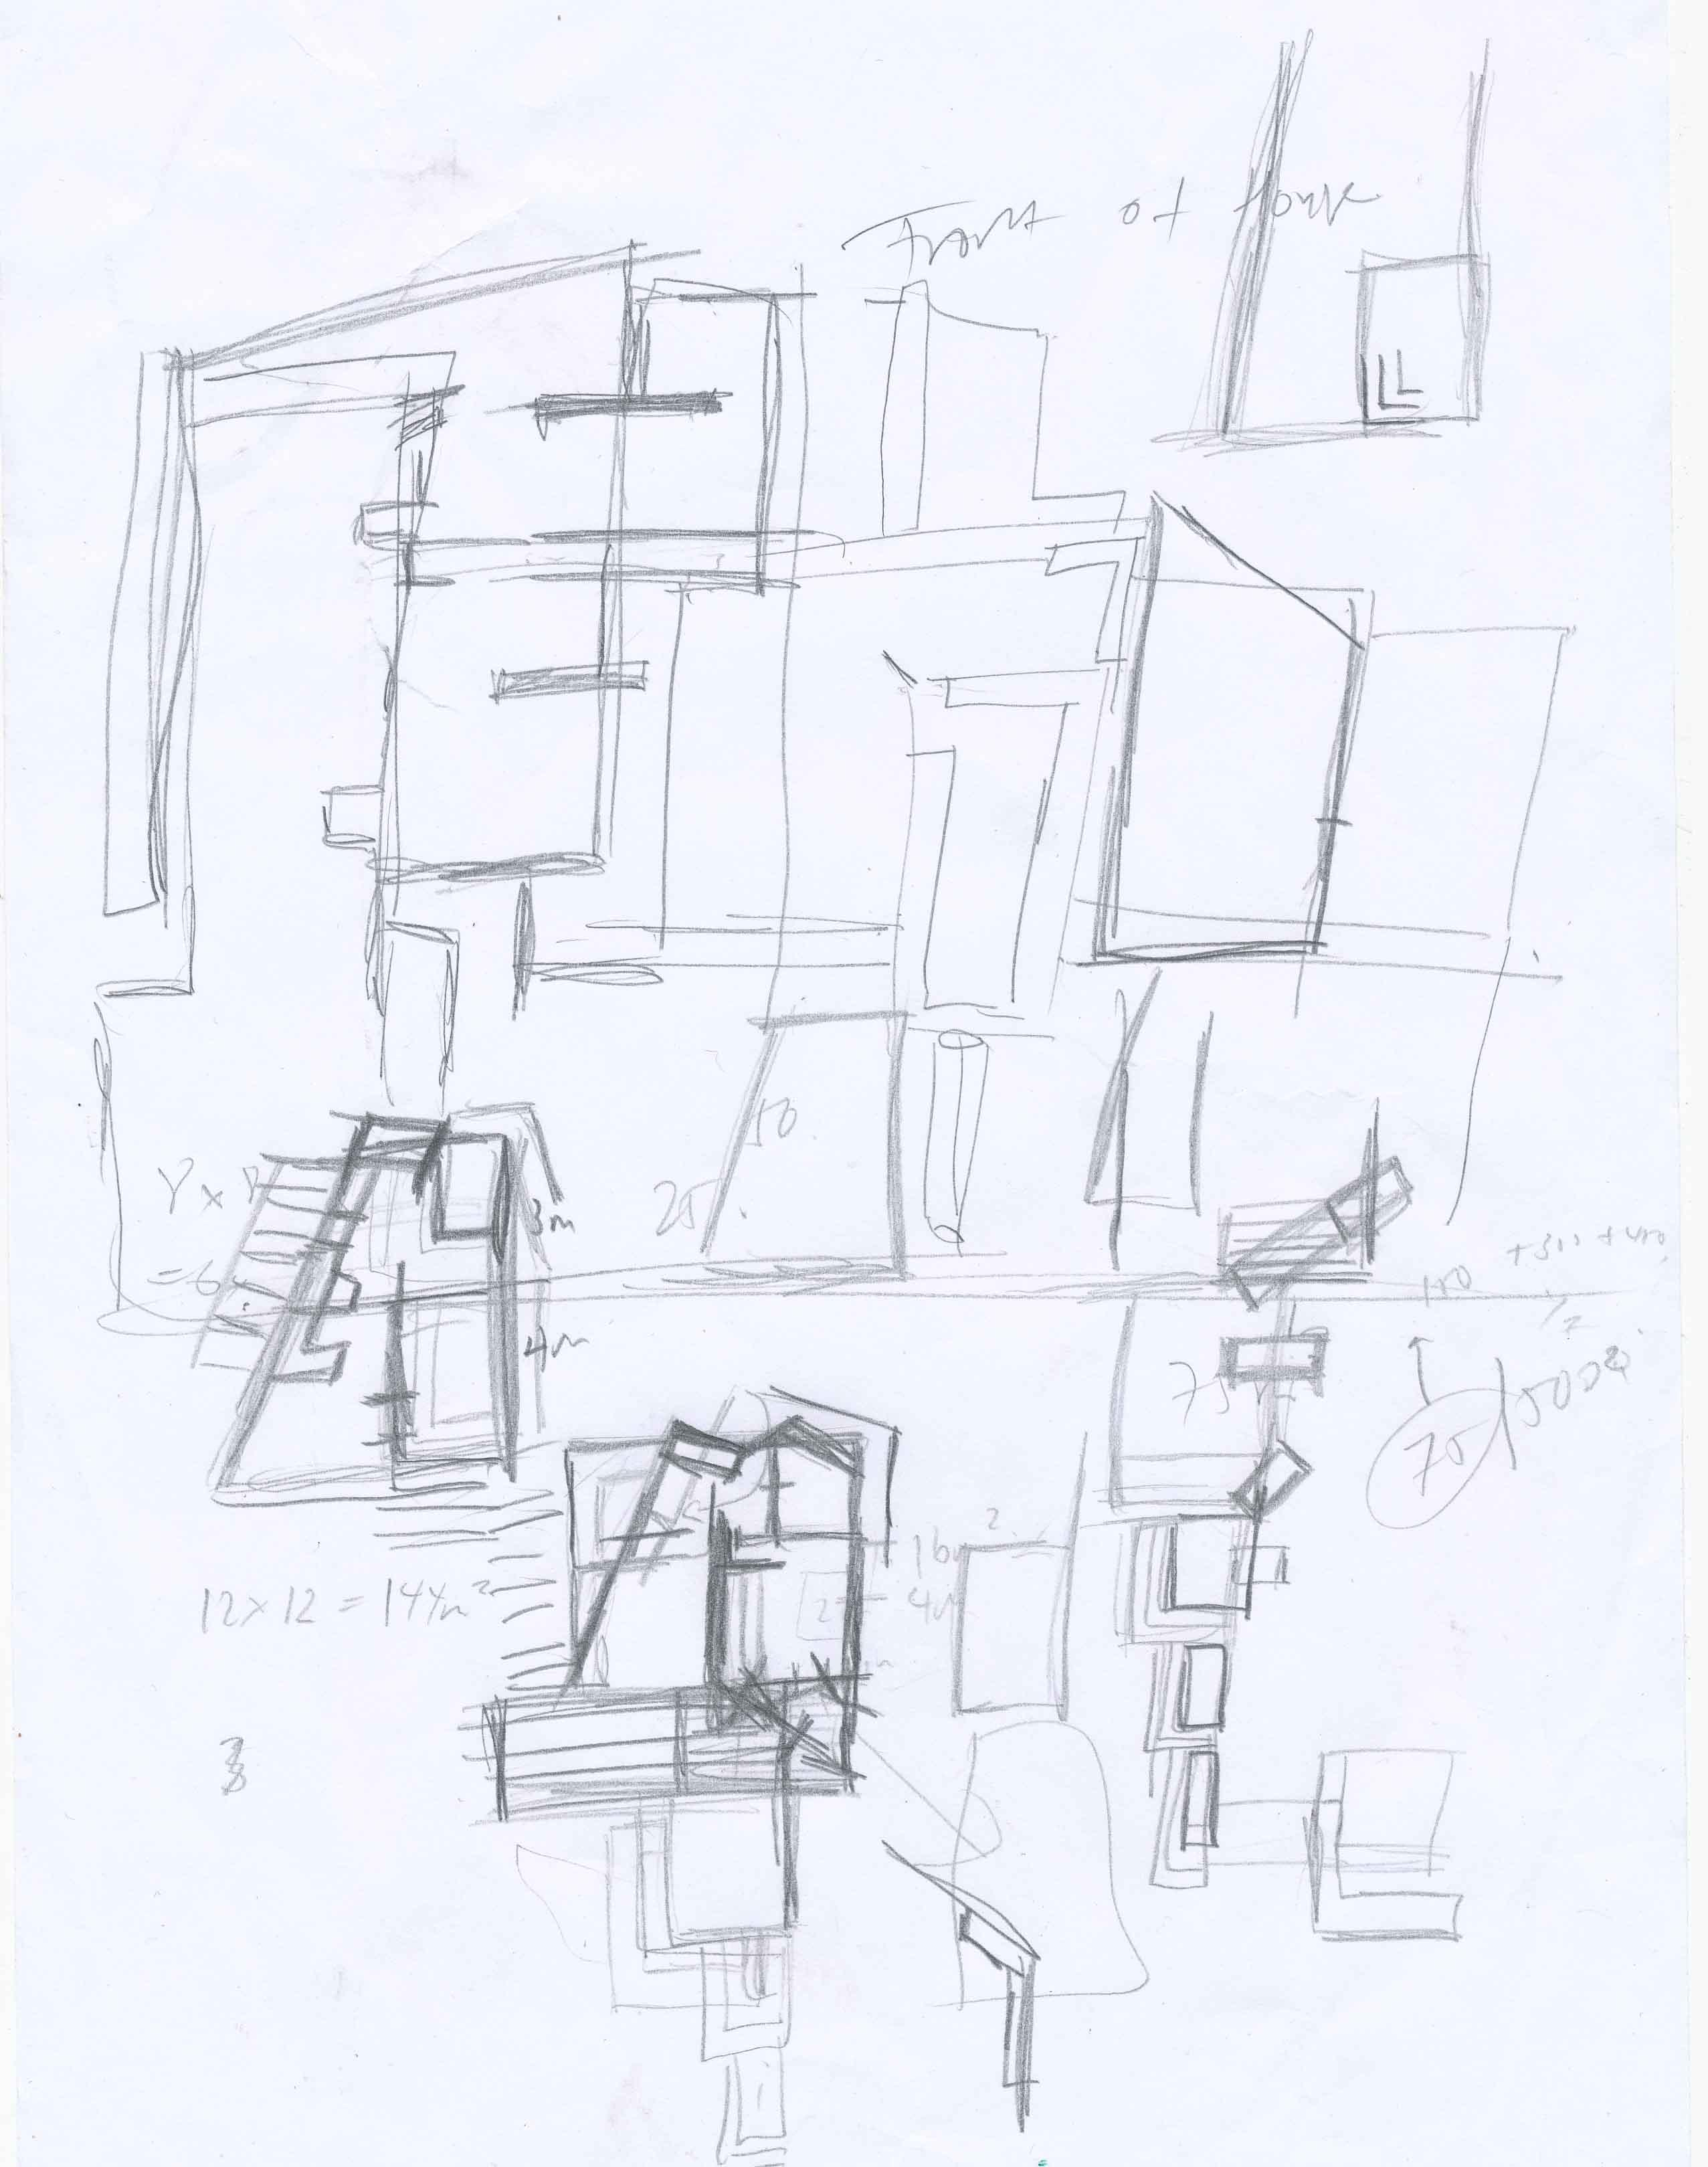 Design Process For Cabin Diagramming